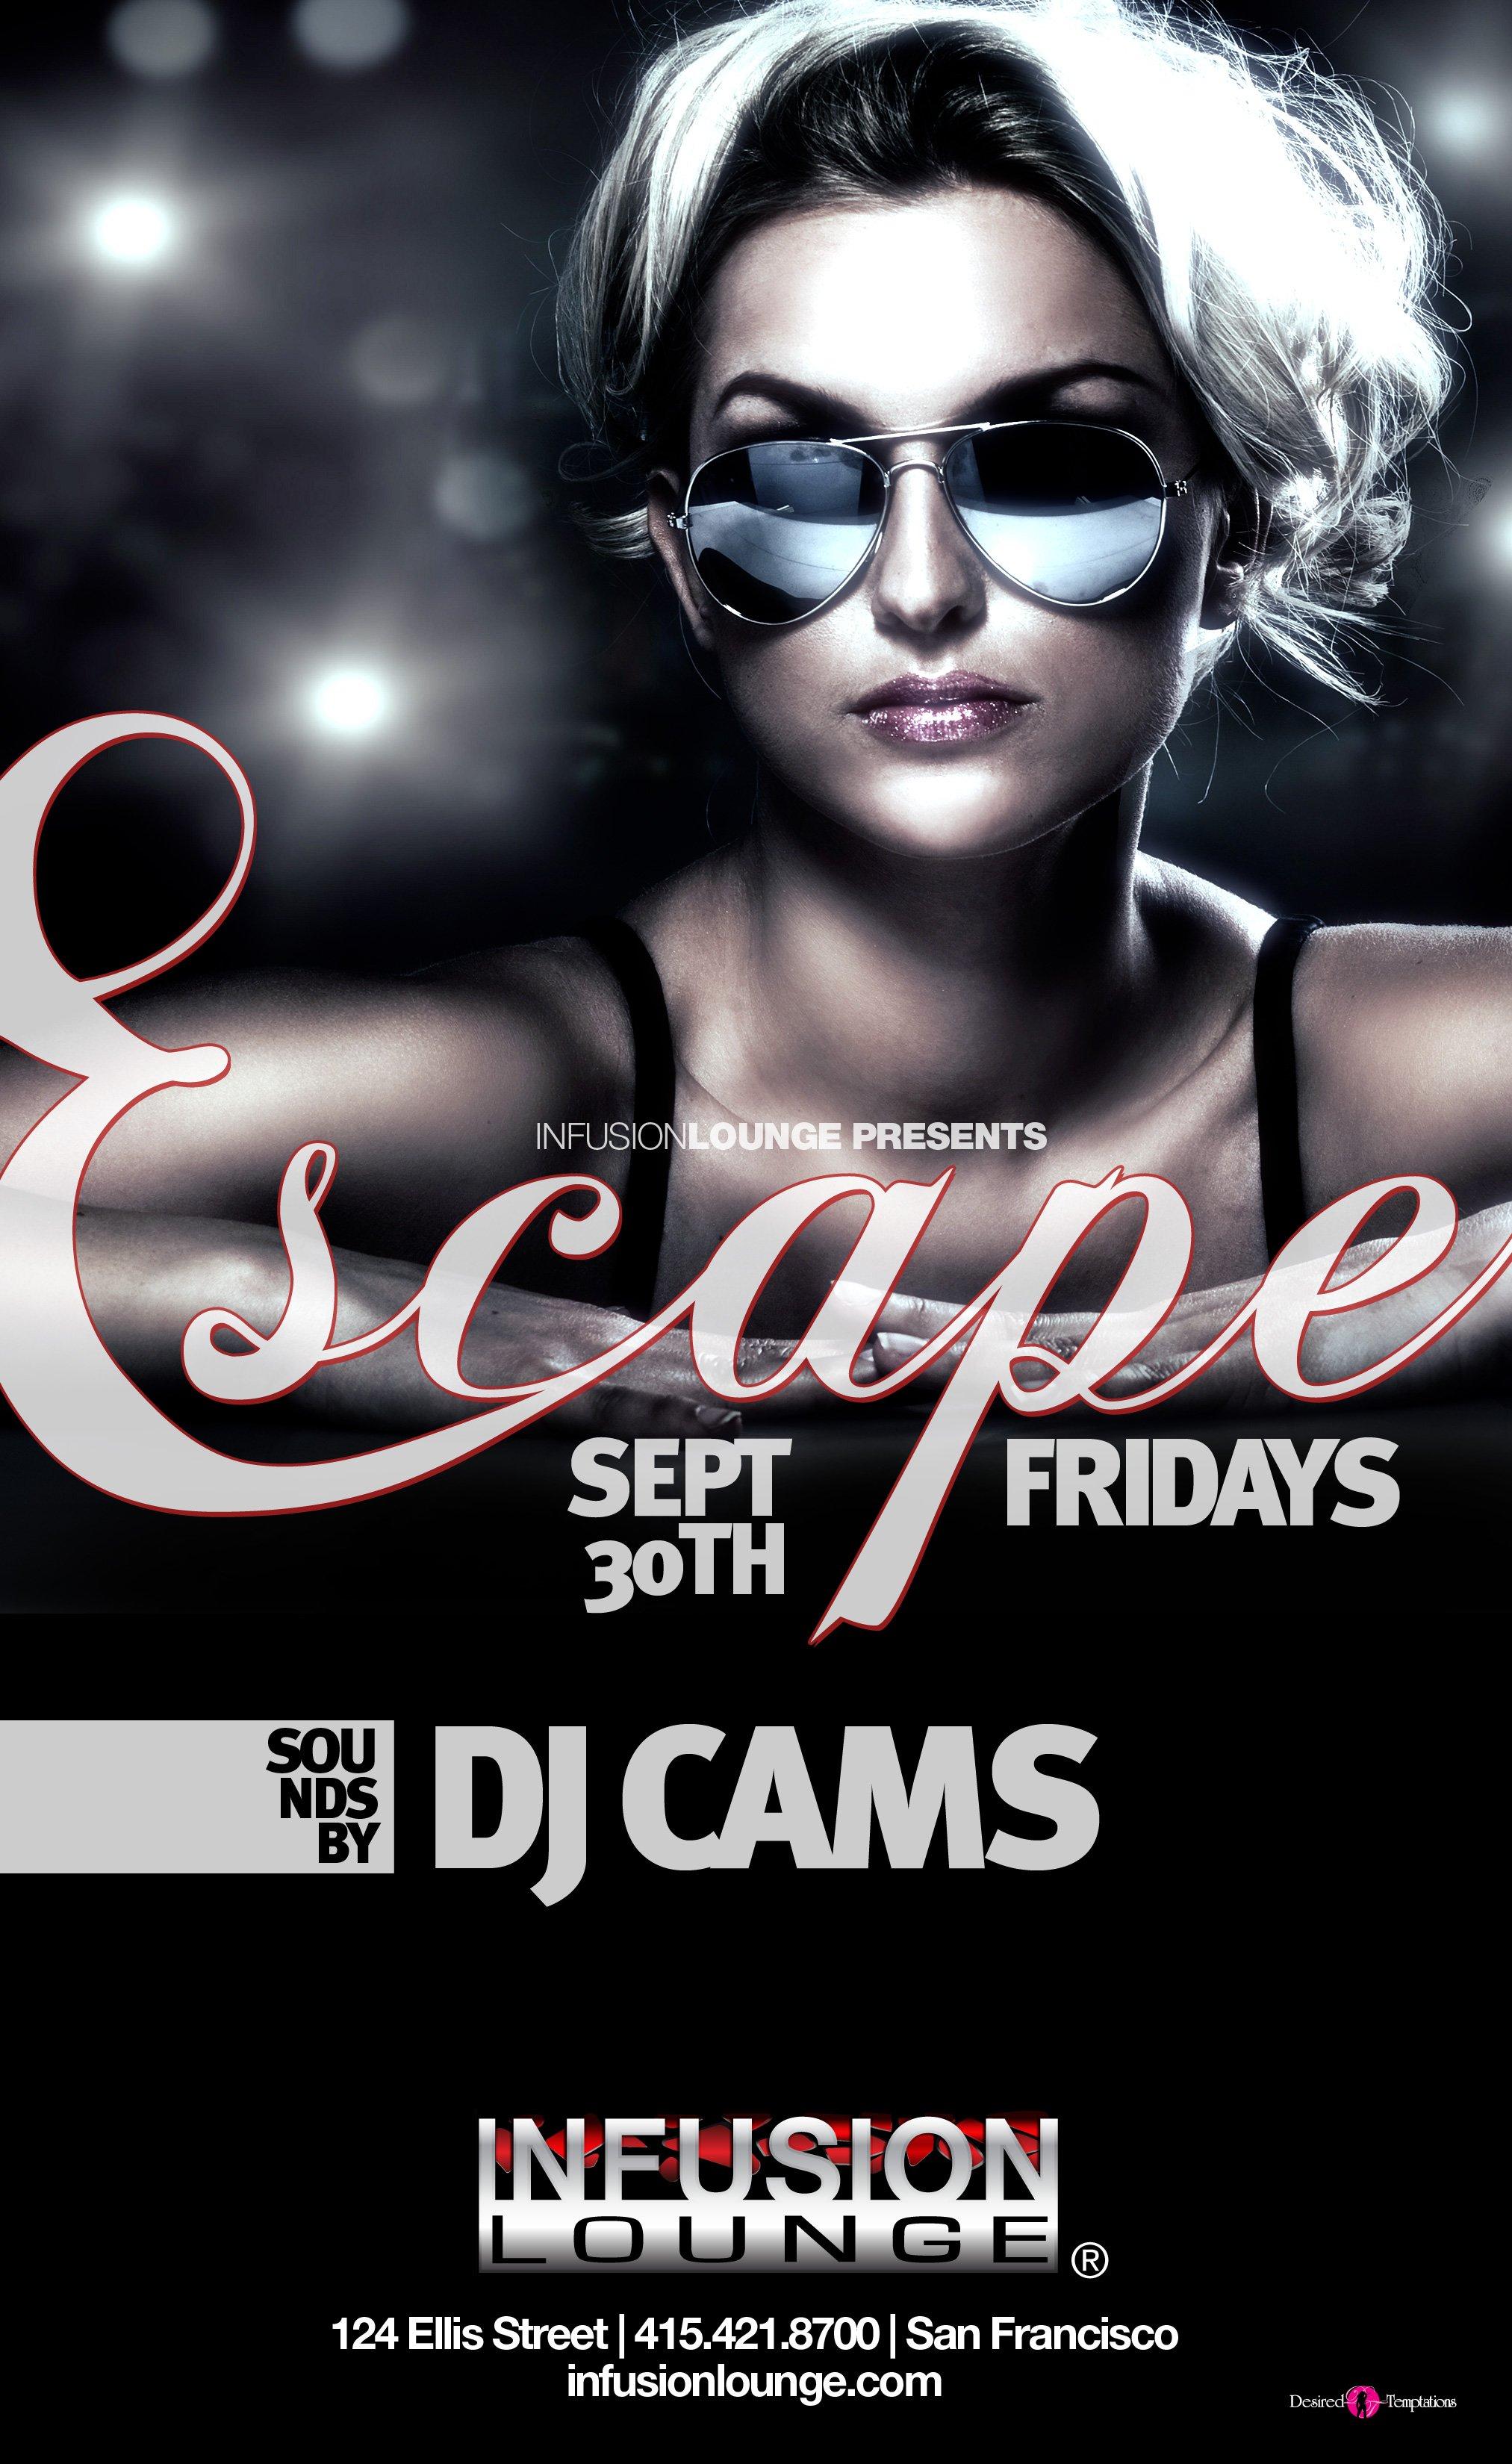 Escape Fridays - Flyer front